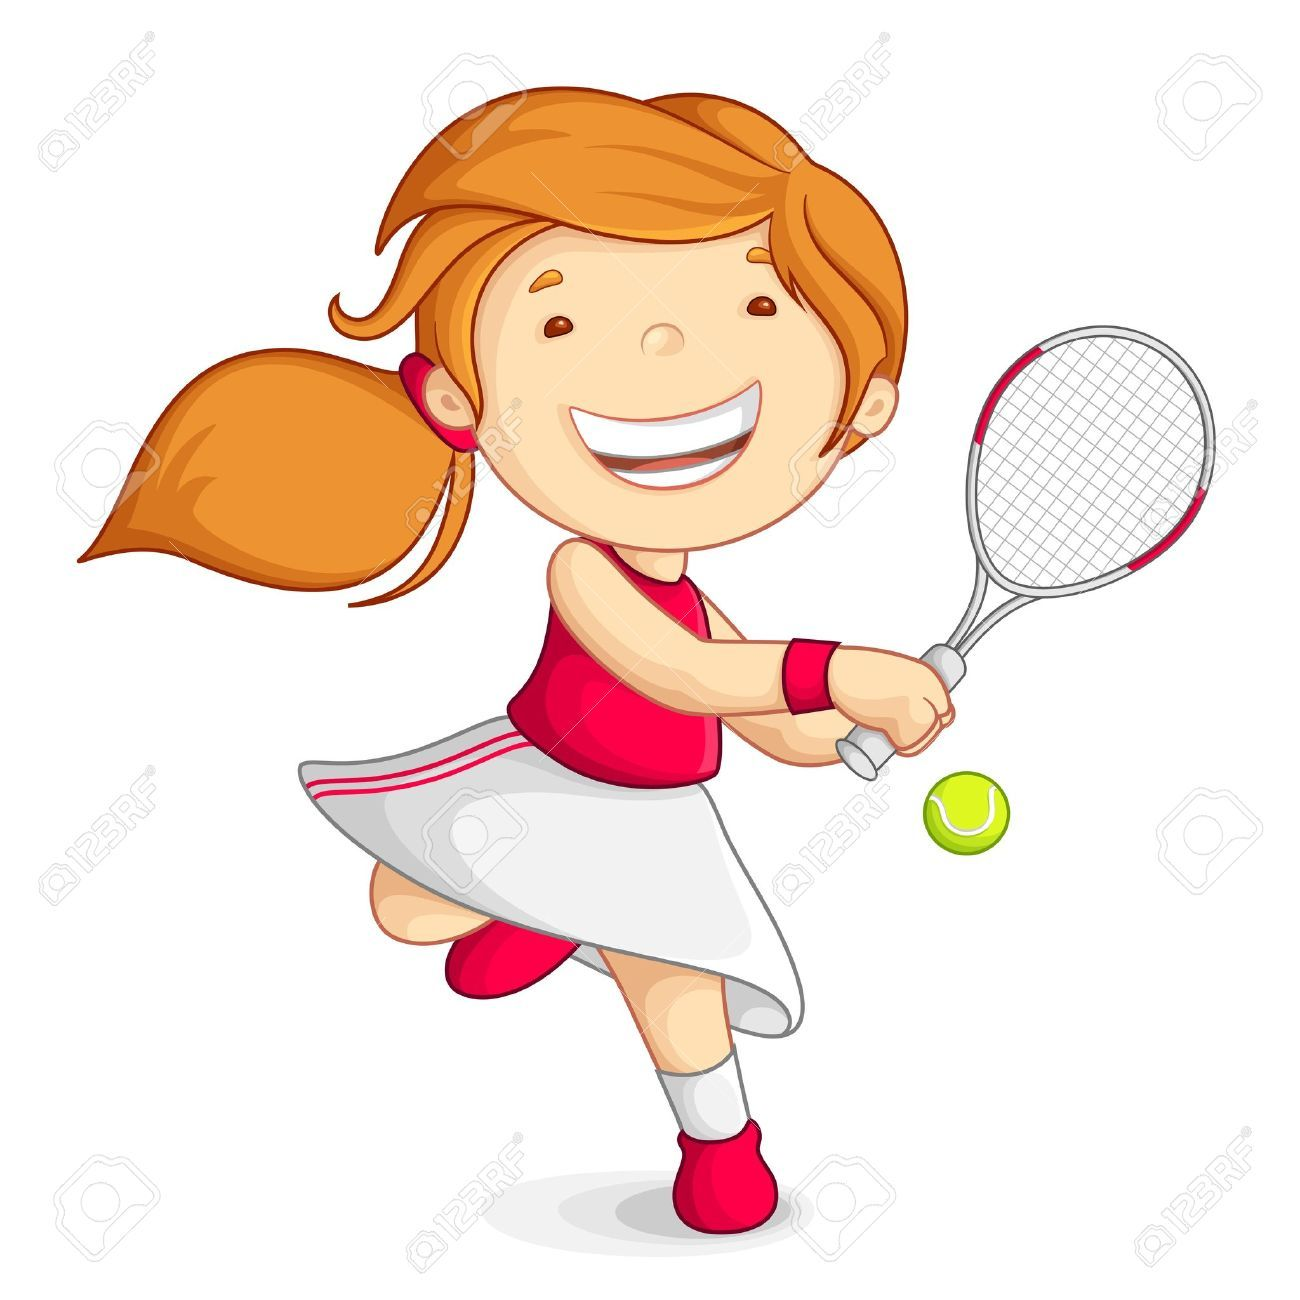 Tennis girl clipart 2 » Clipart Portal.